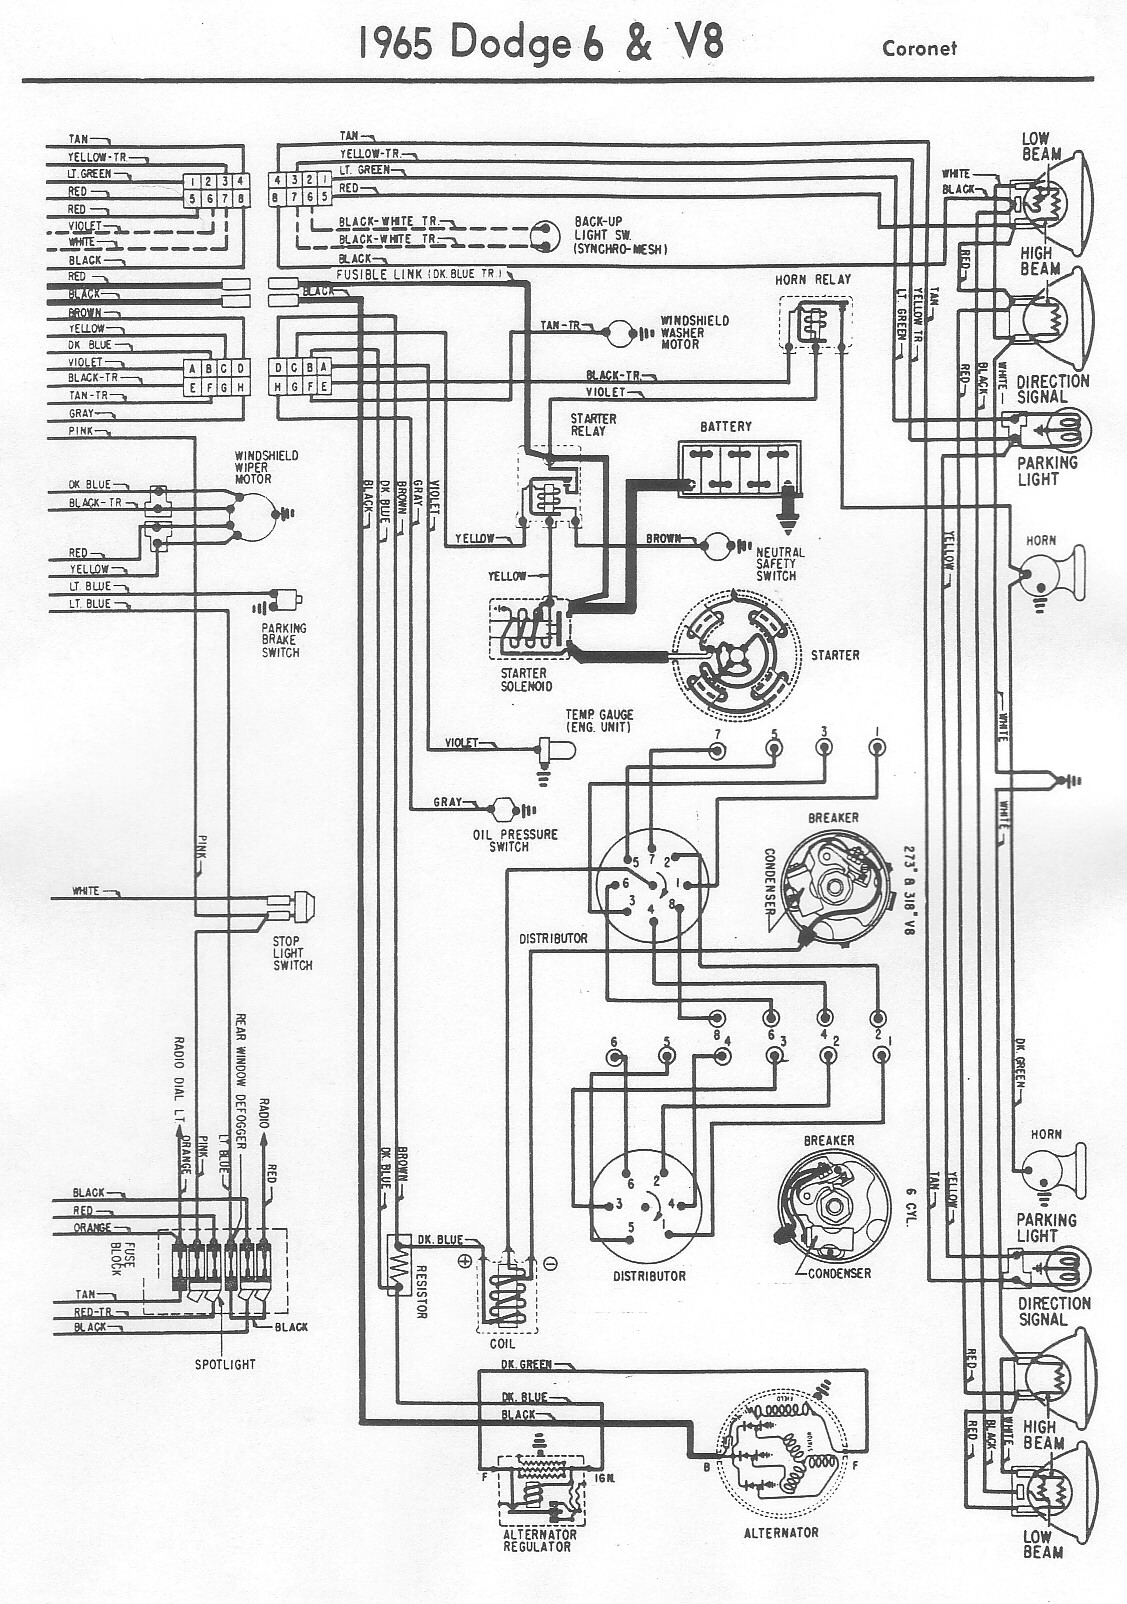 medium resolution of wrg 4272 63 chevy nova wiring diagram1966 chevy nova wiring diagram 17